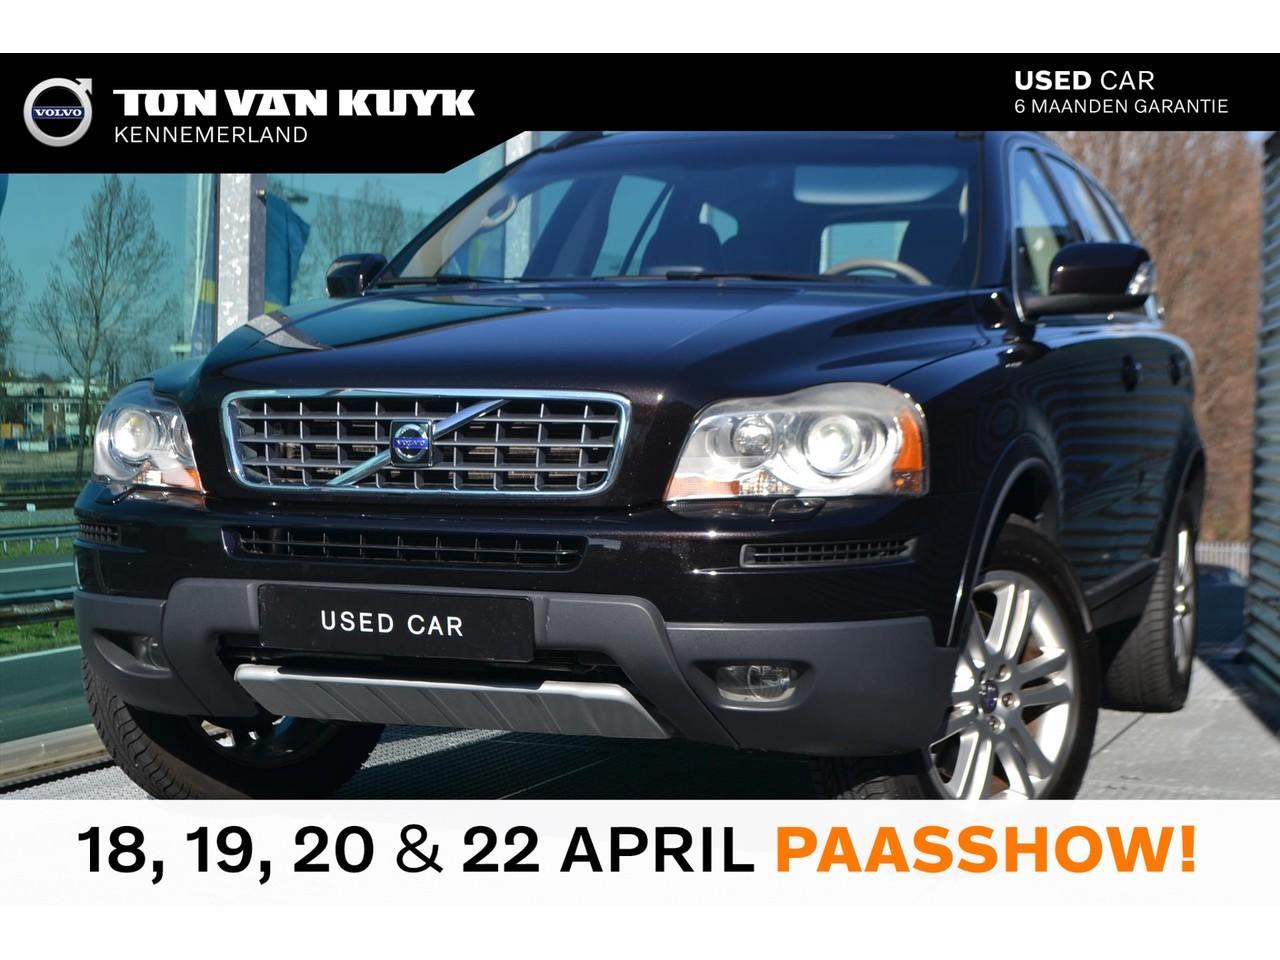 Volvo Xc90 2.4 d5 geartronic 7 seater summum / camera / trekhaak